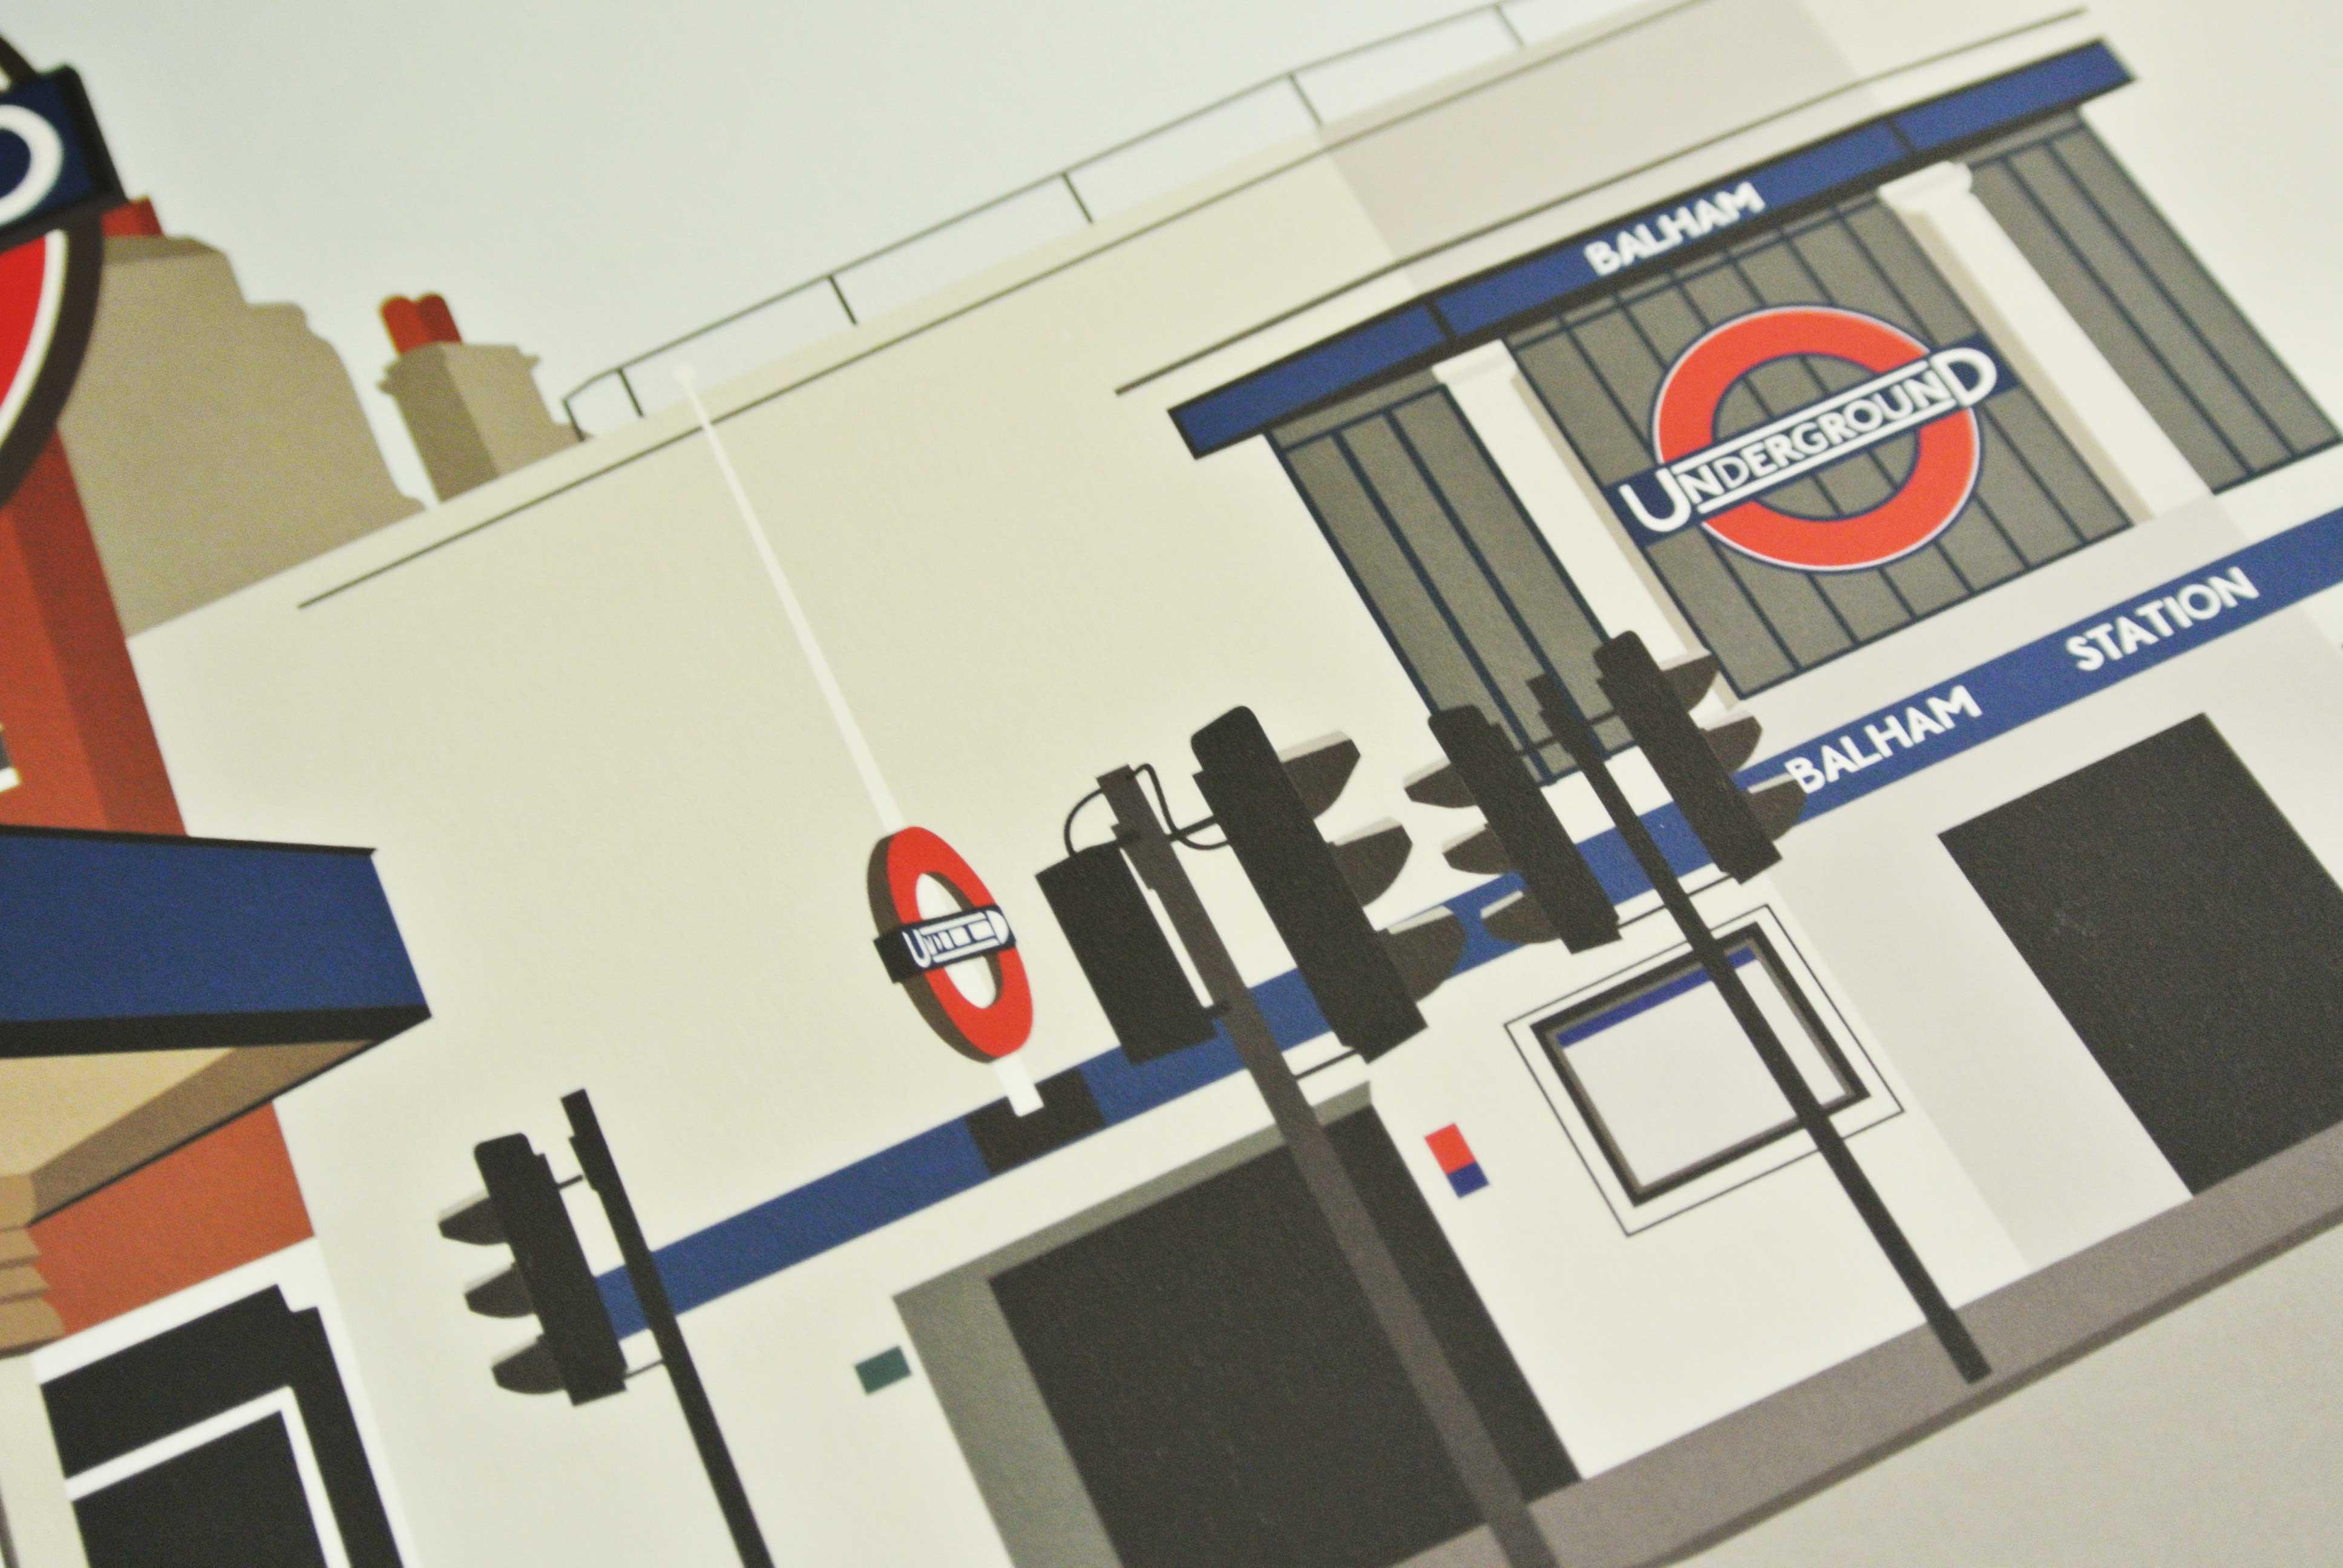 Balham Tube Underground Station Art Poster Print Close-up